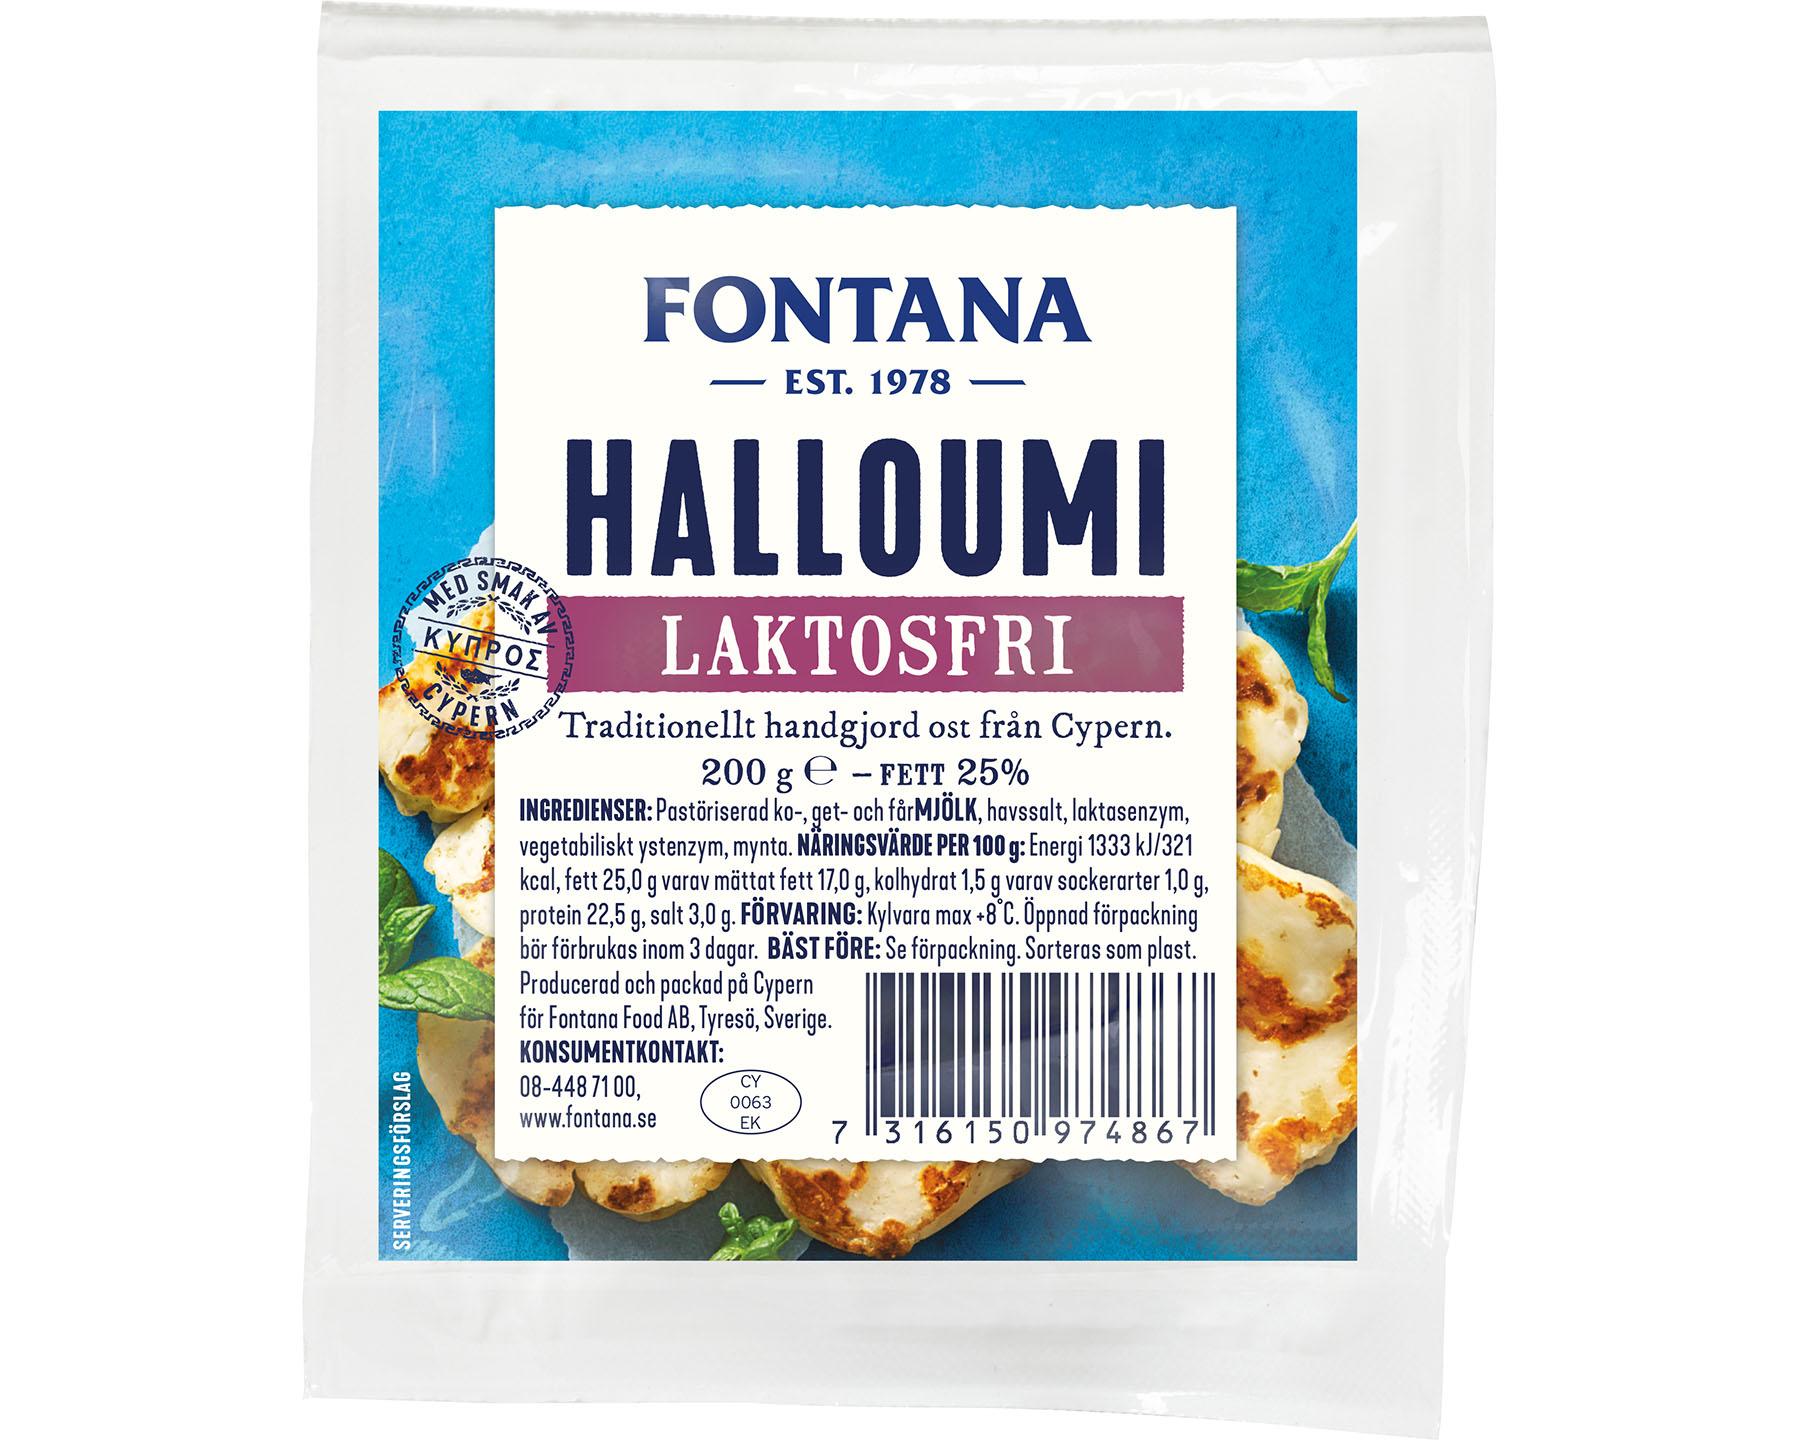 Fontana Halloumi Laktosfri